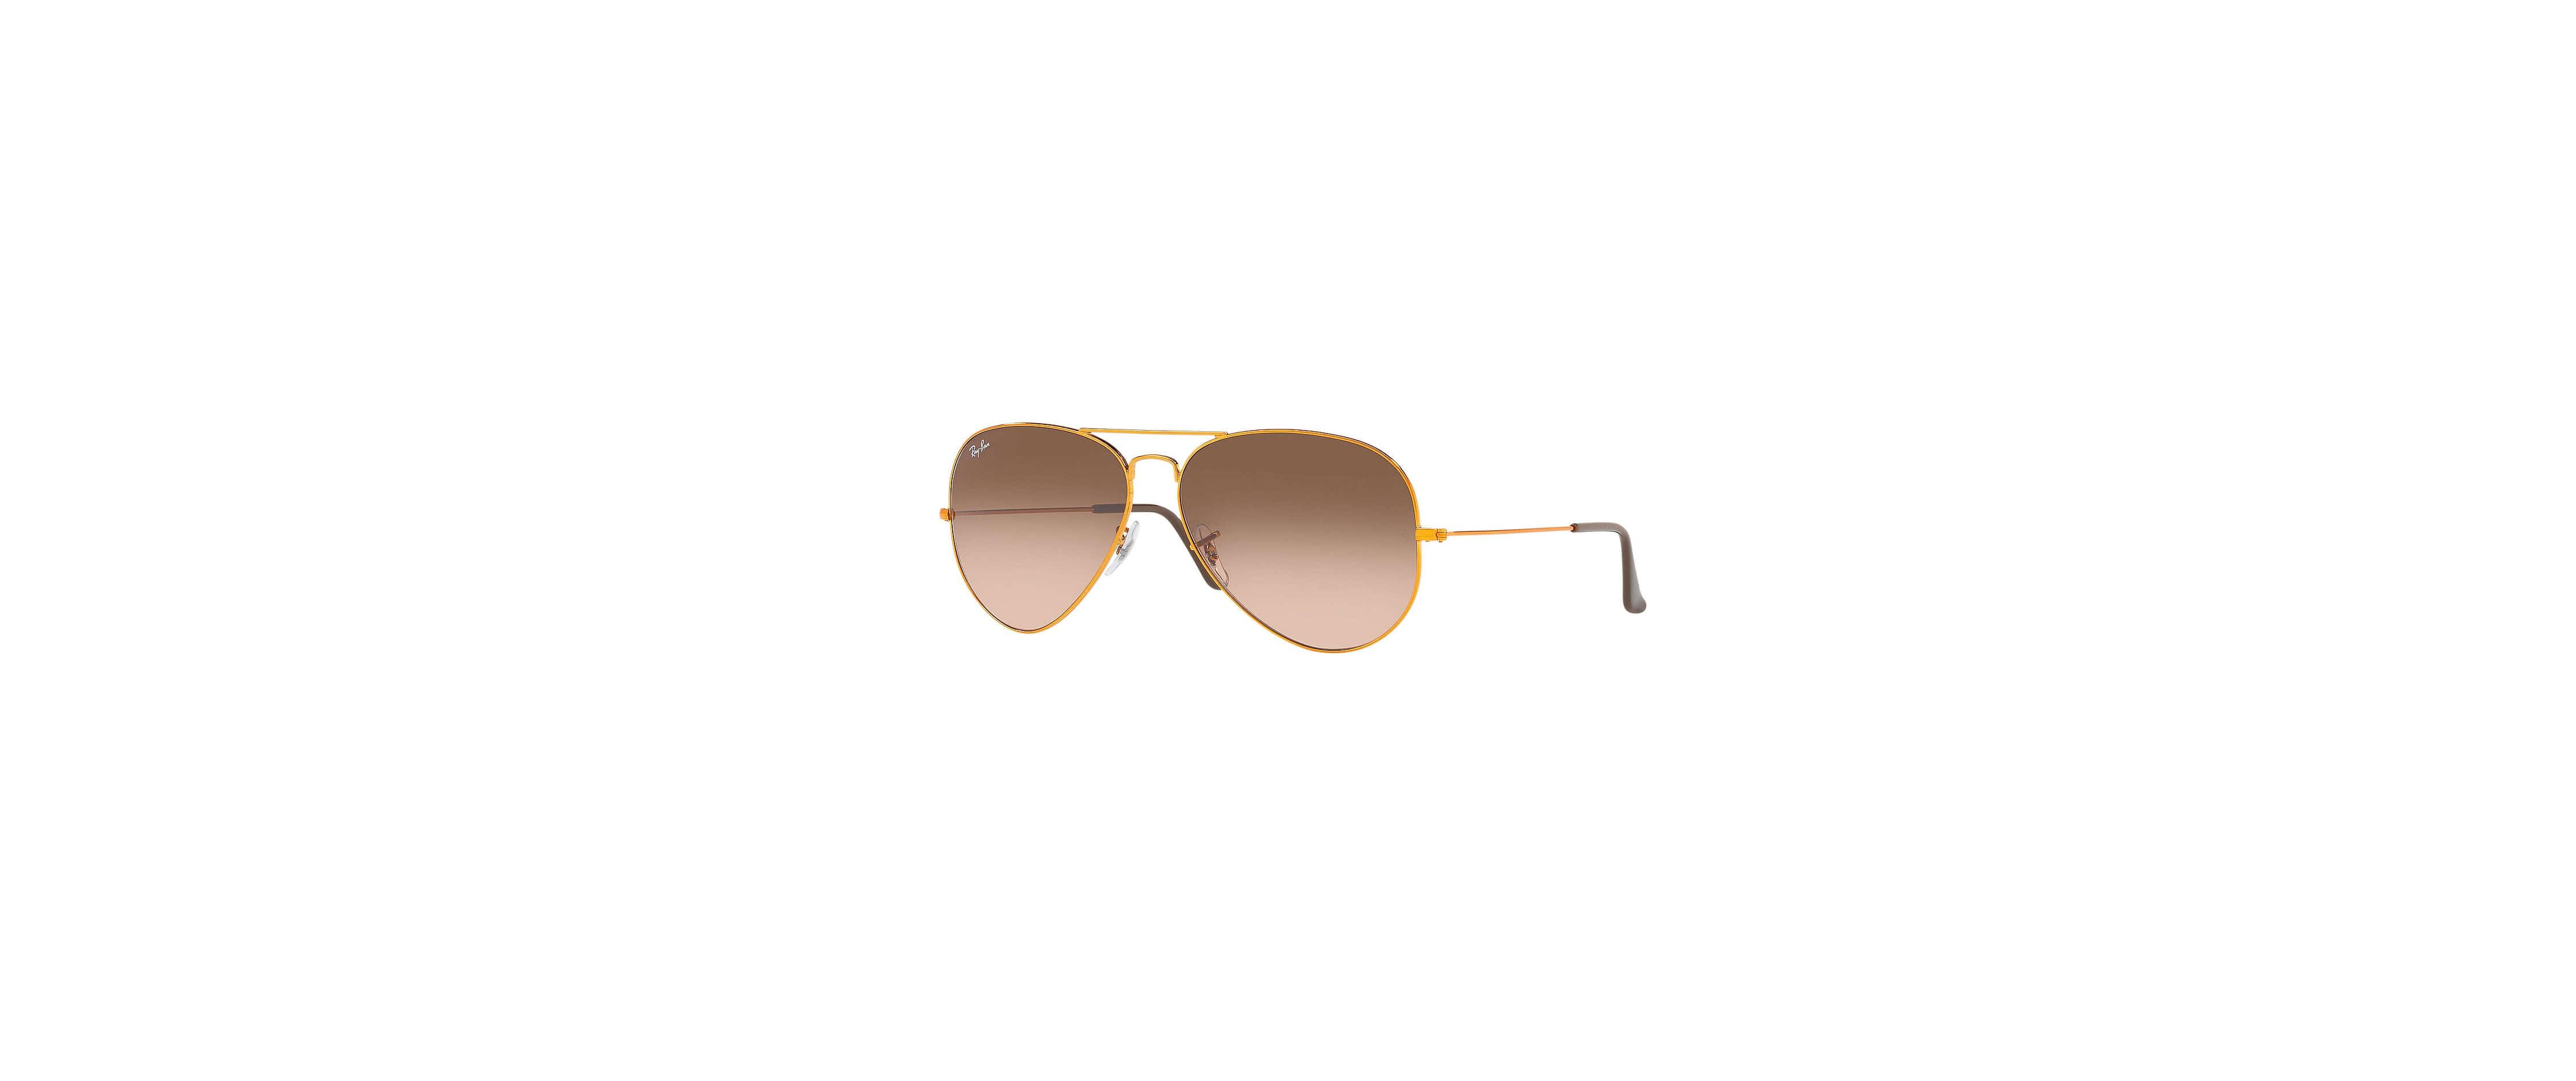 ray ban aviator sunglasses womens  Accessories for Women - Sunglasses